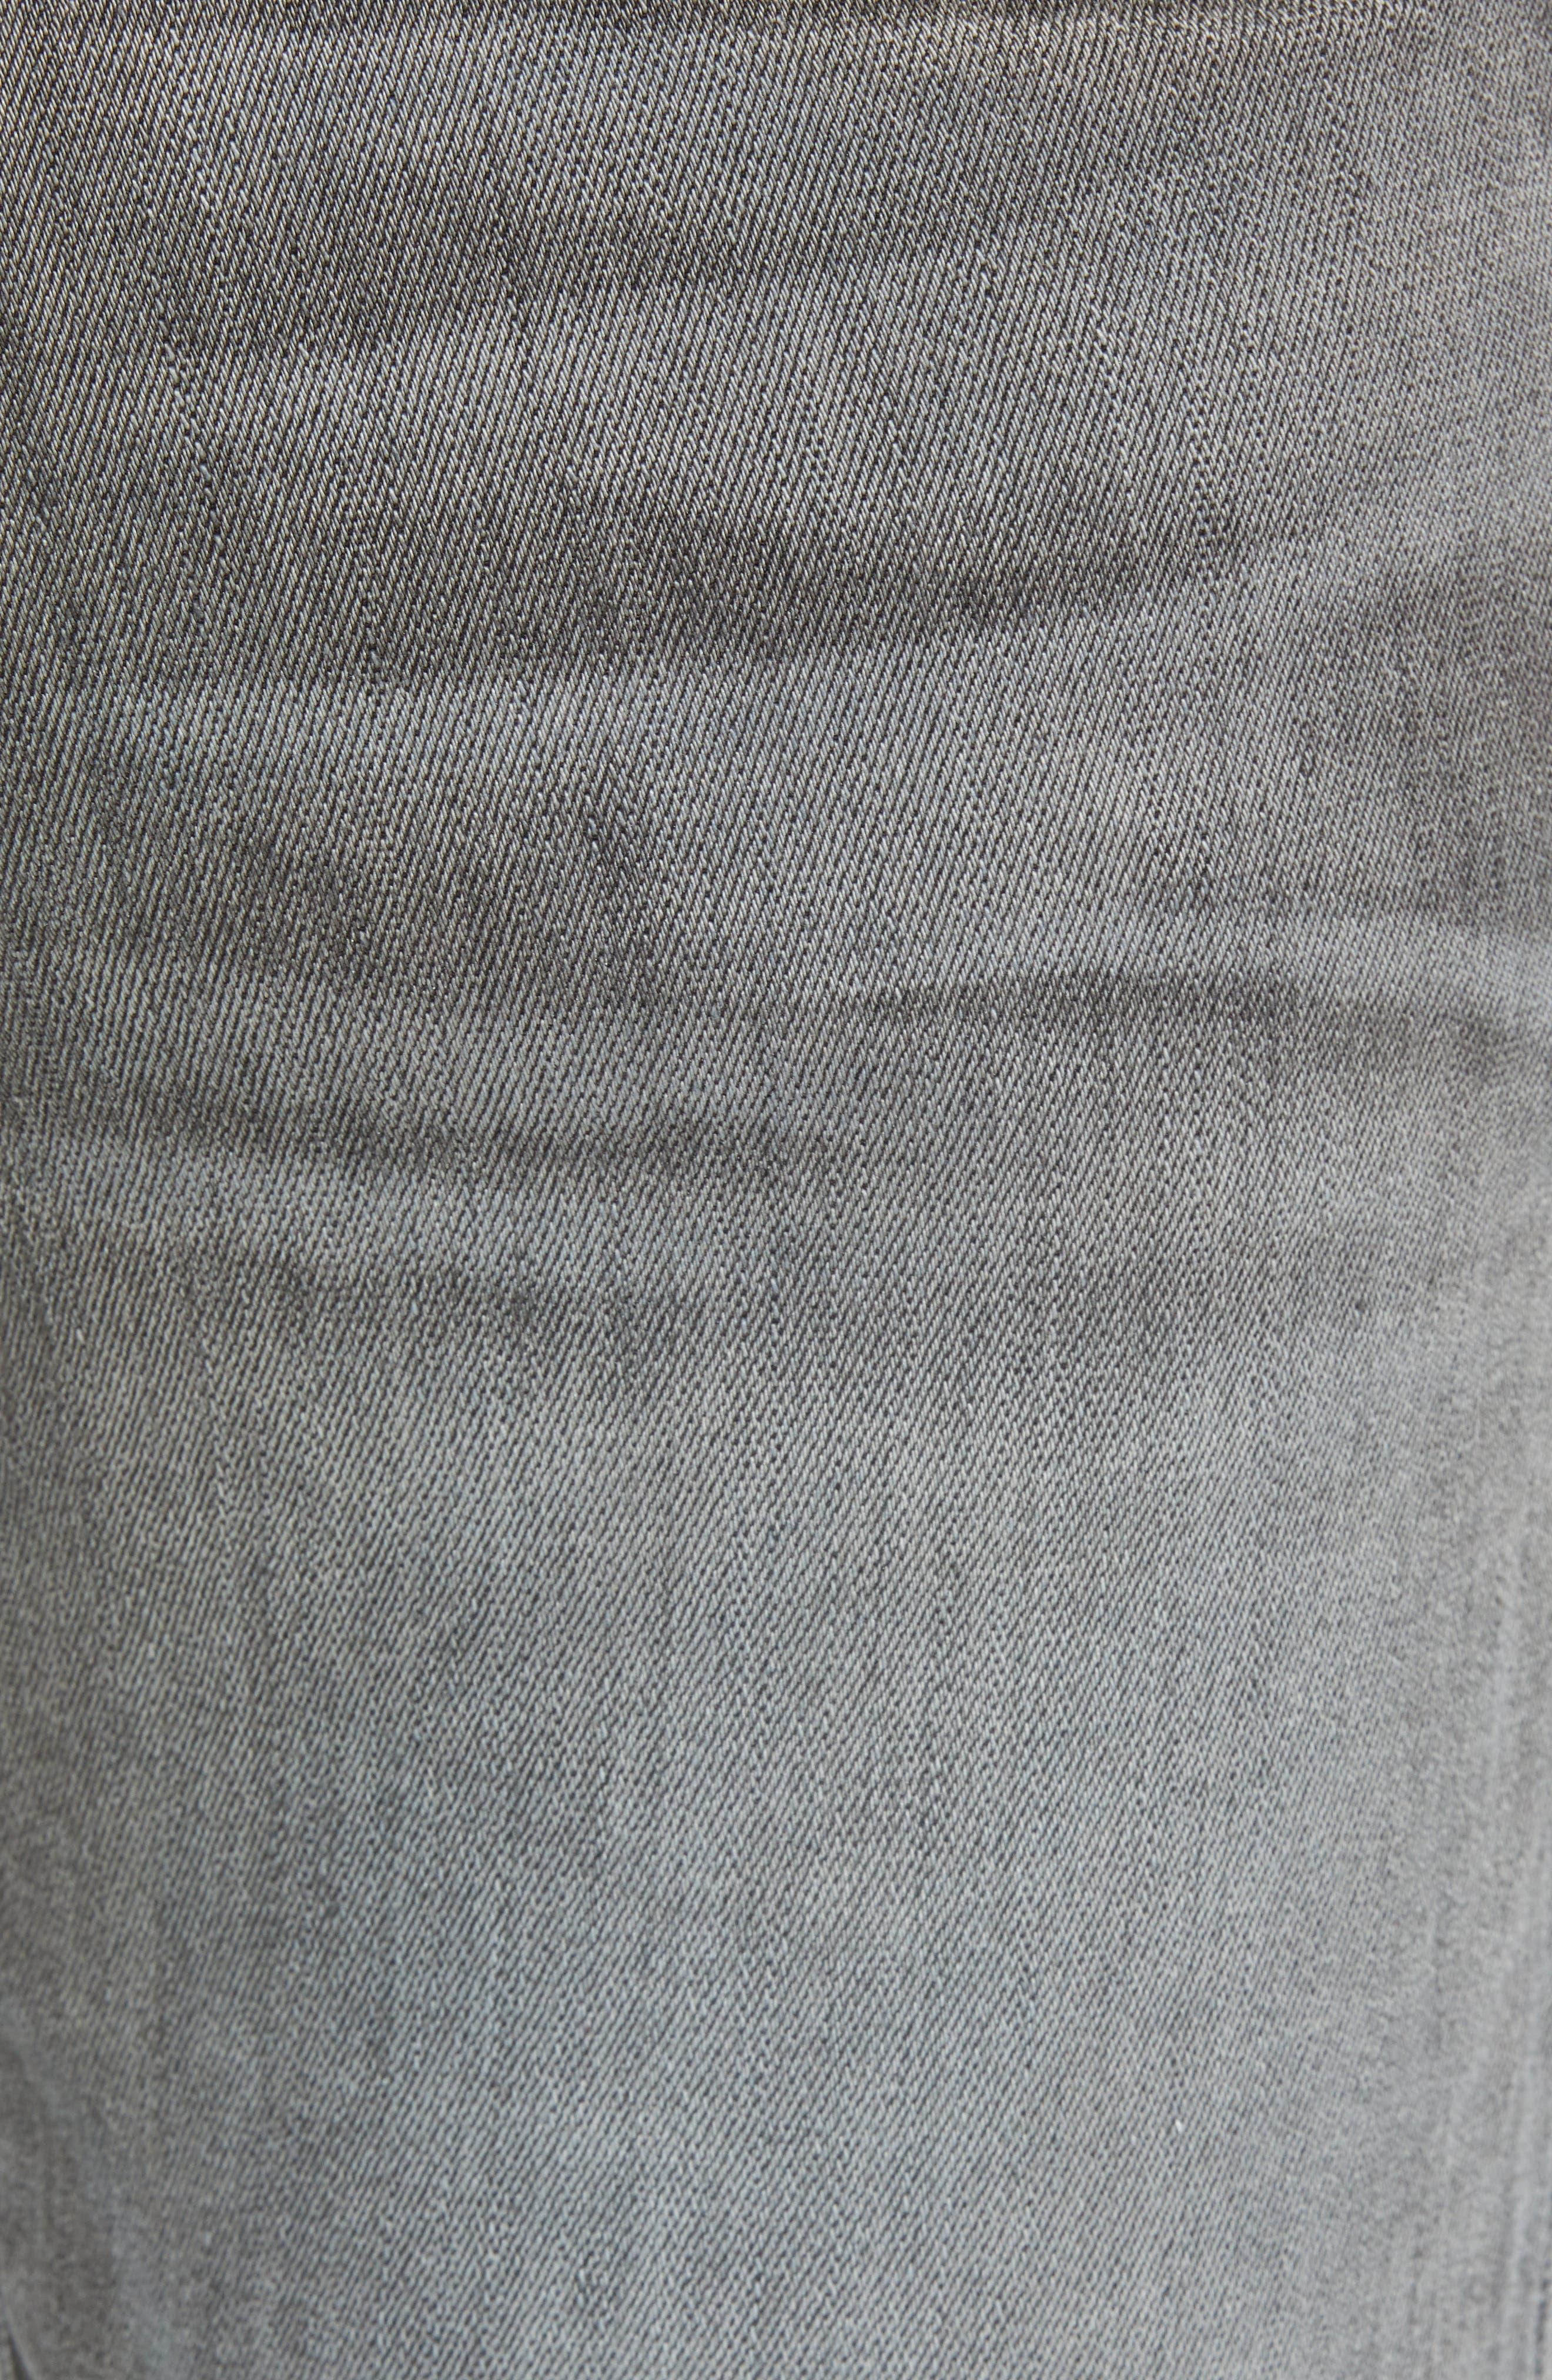 L'Homme Skinny Skinny Fit Jeans,                             Alternate thumbnail 5, color,                             FORT MCHEN